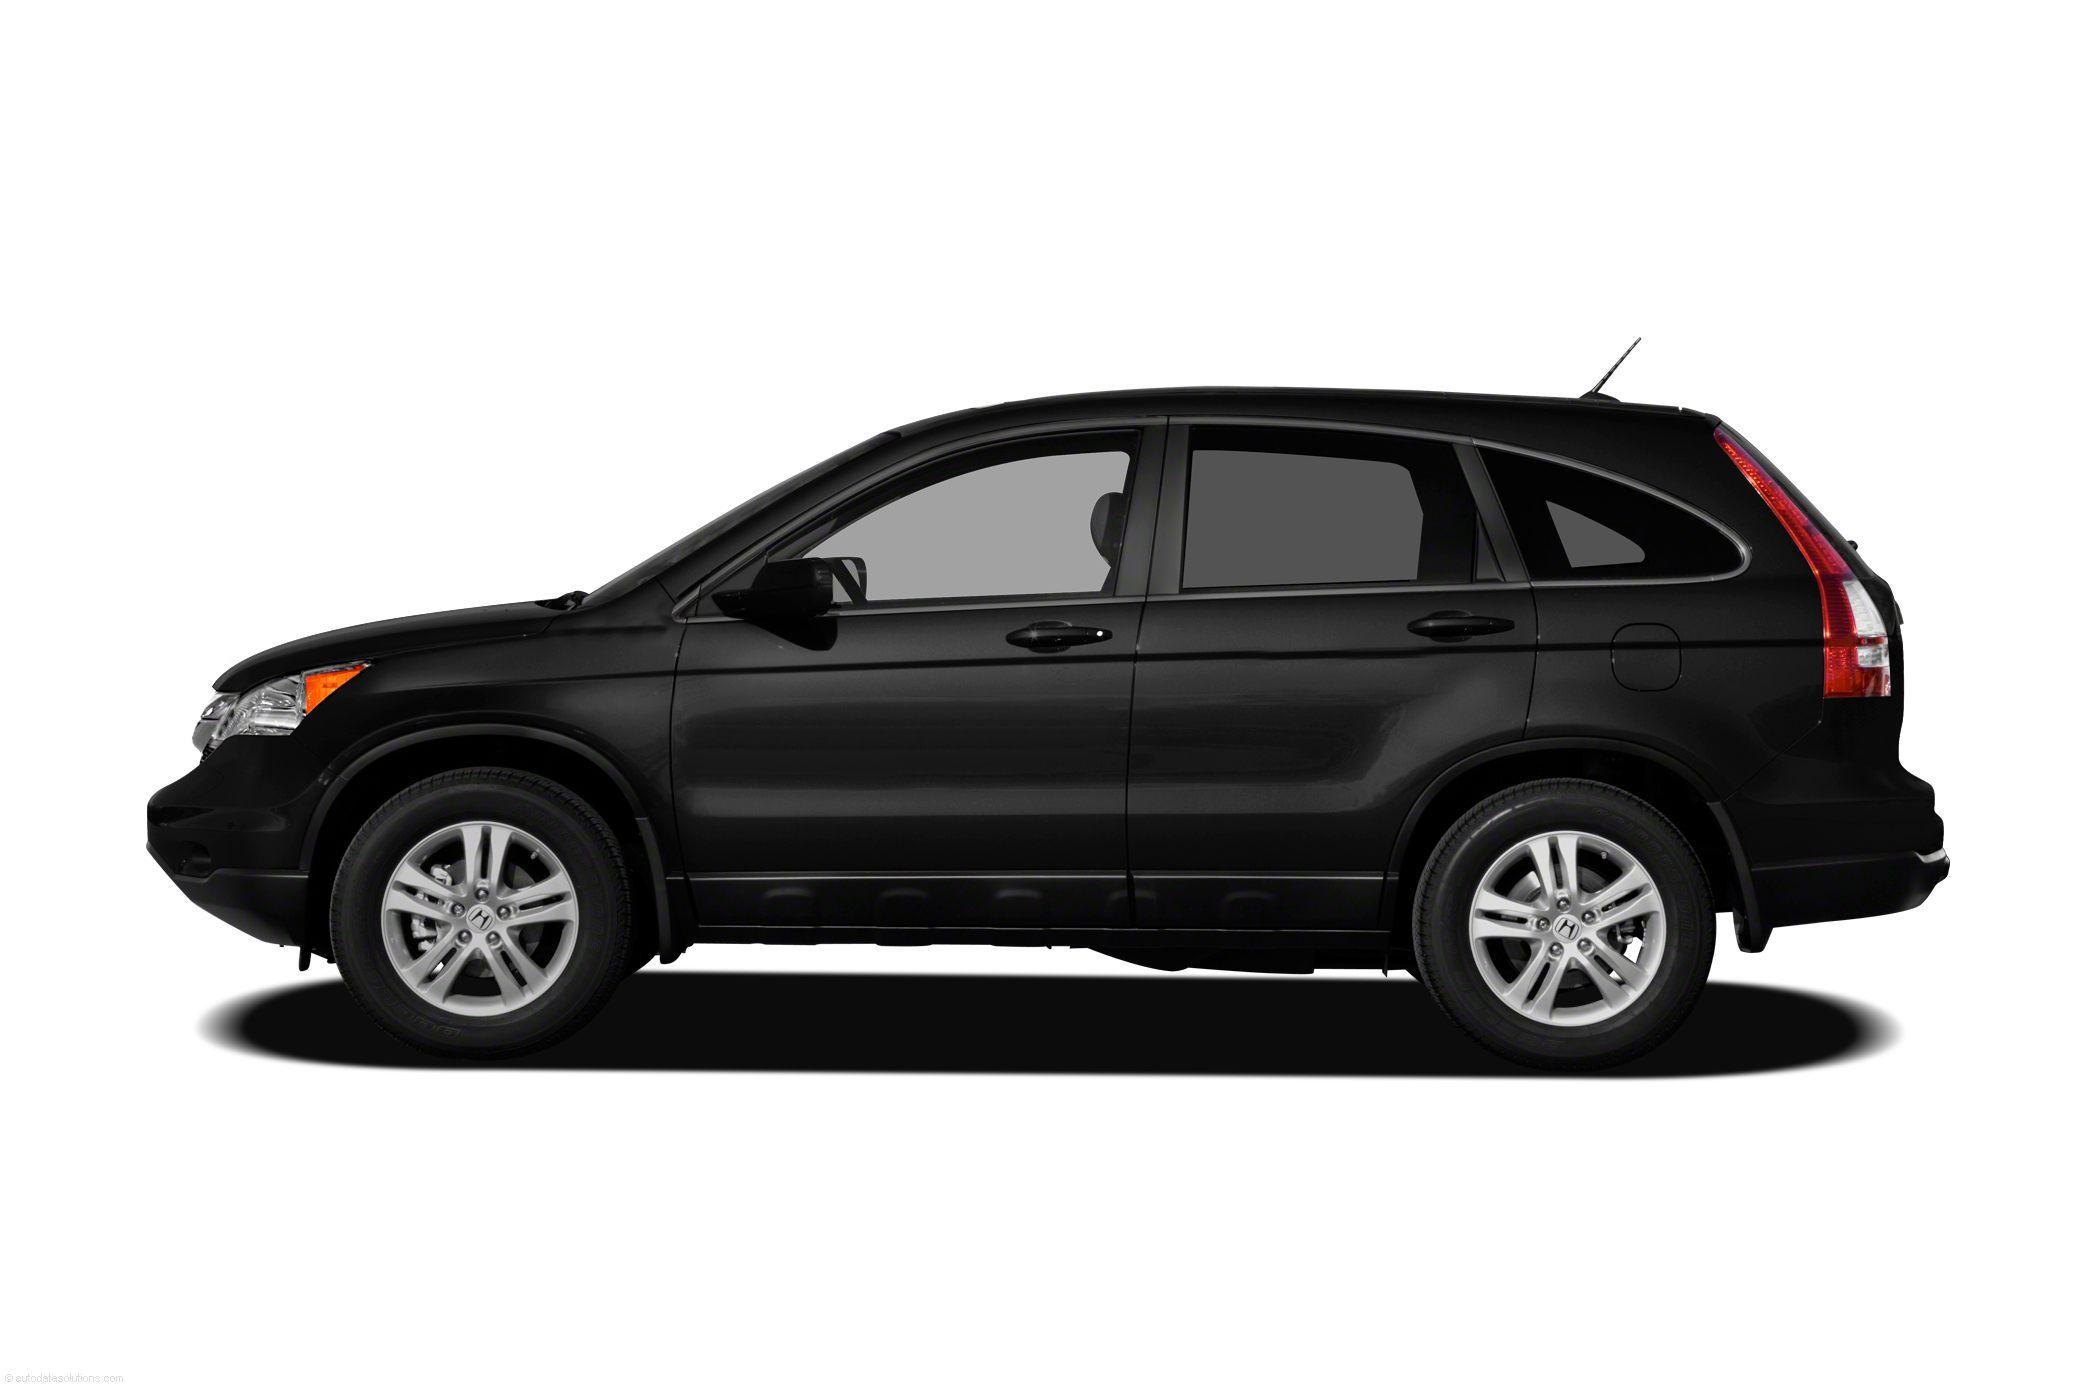 2011 Honda Cr V Image 12